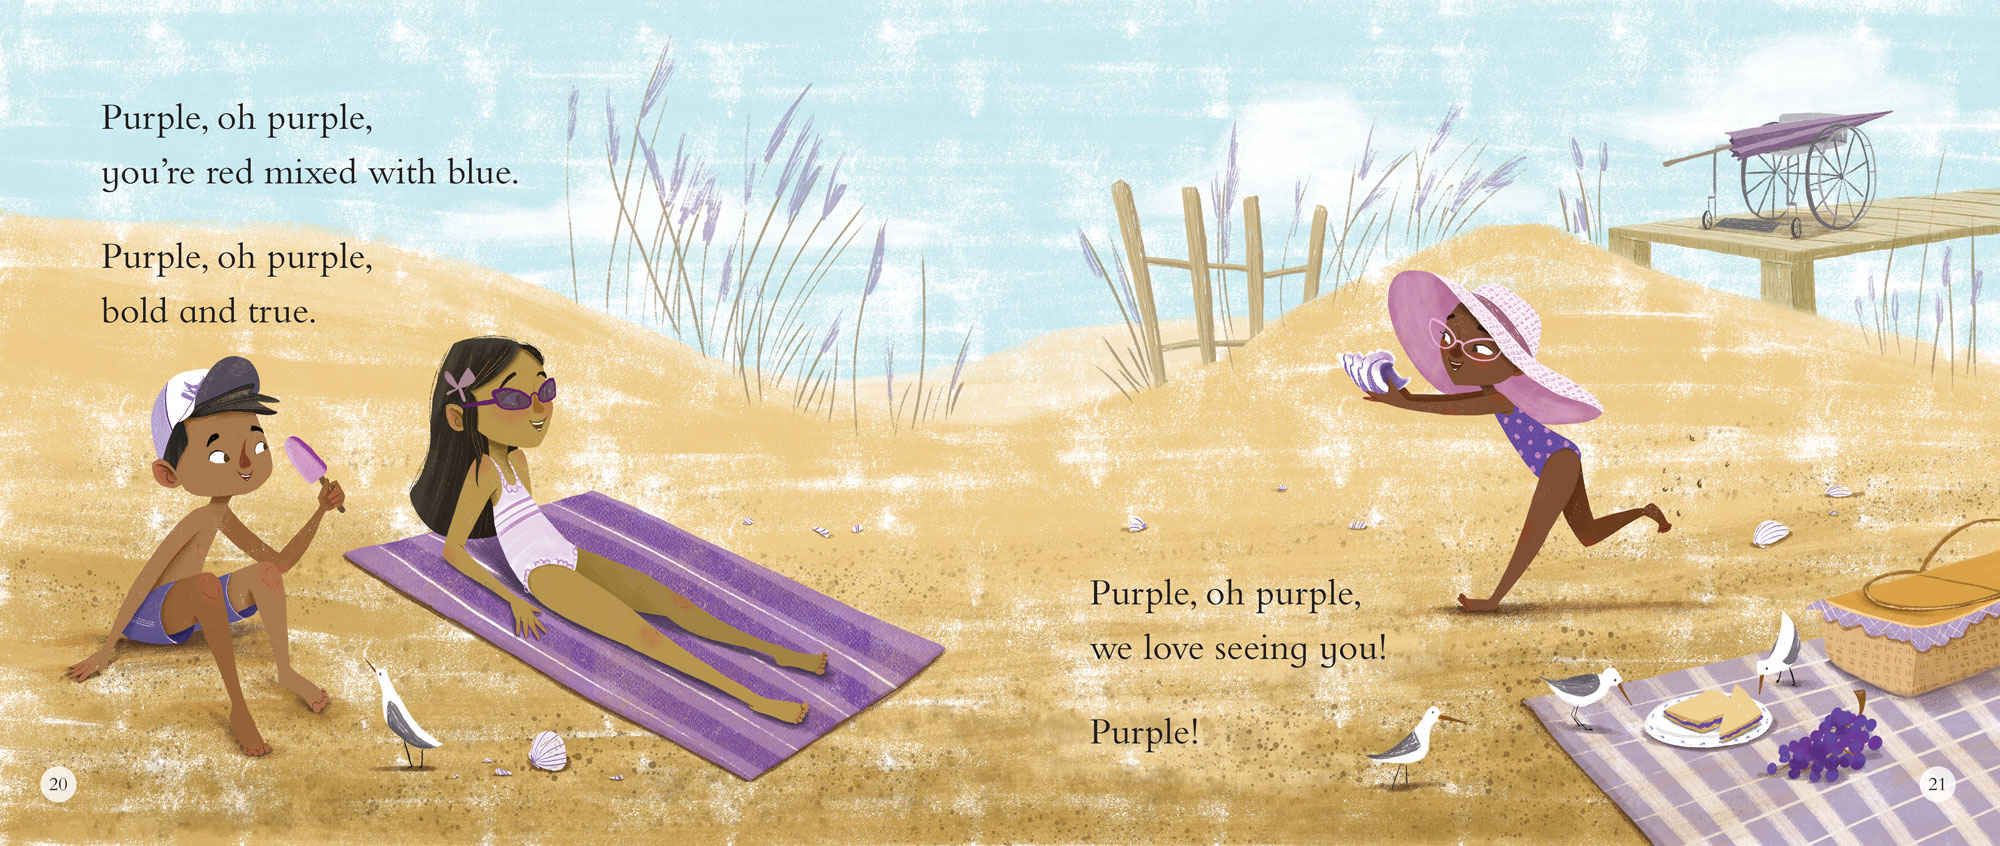 purple-20-21.jpg